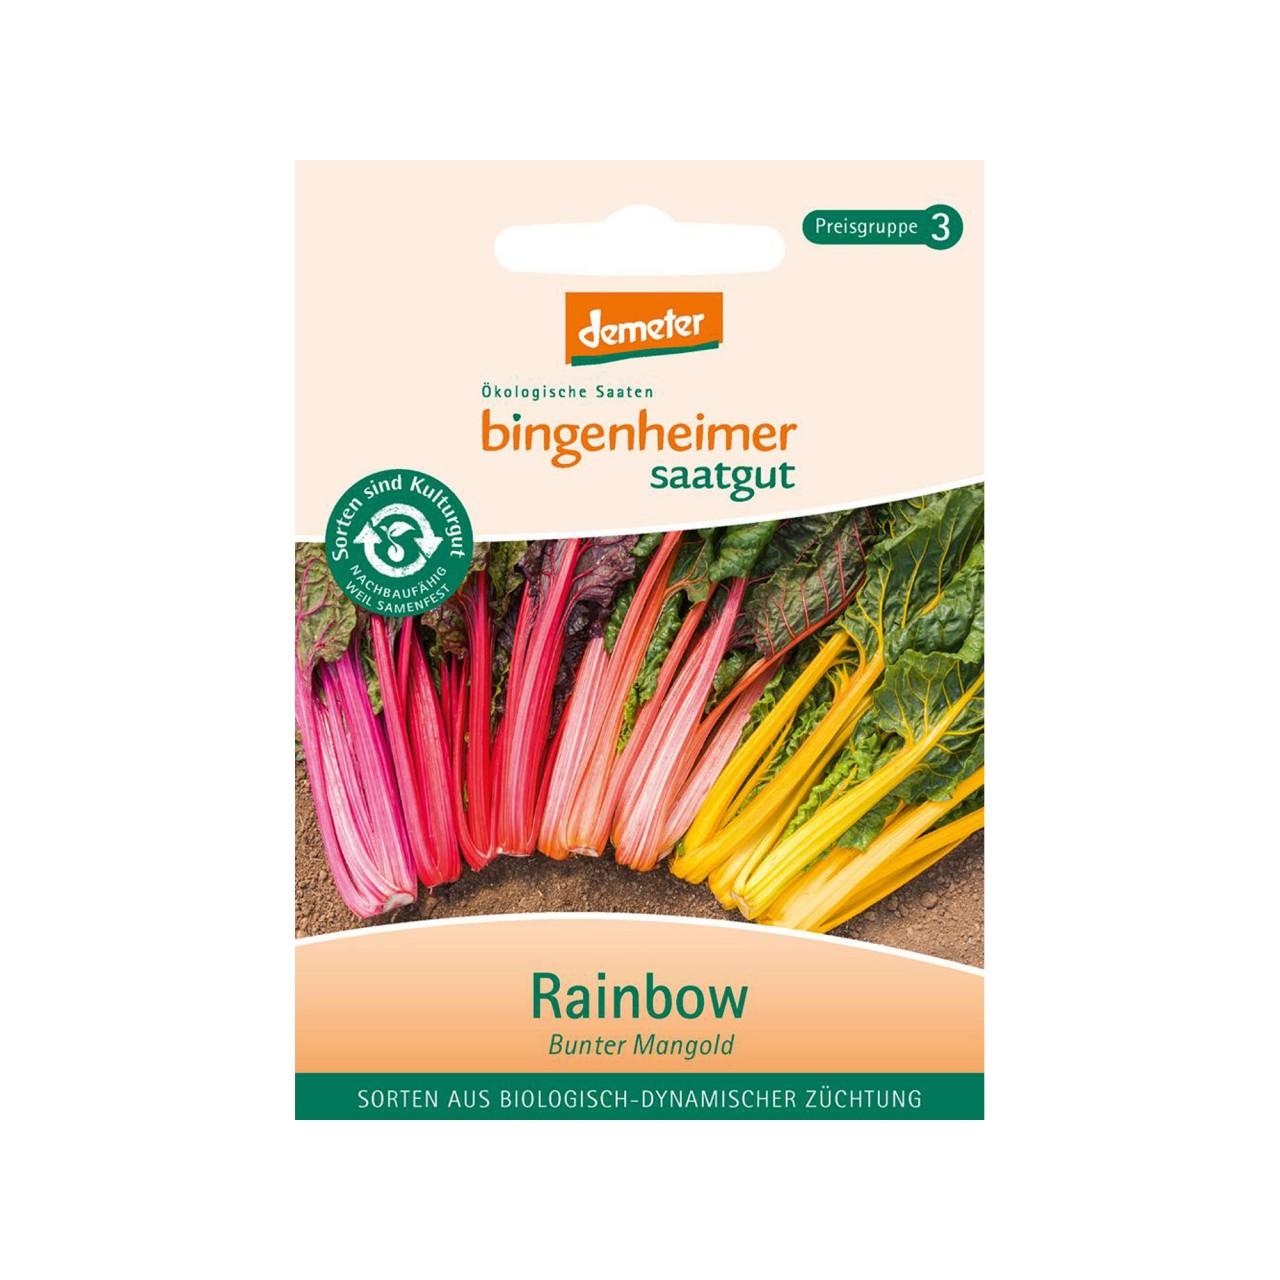 Mangold bunt - Rainbow - Bio-Samen